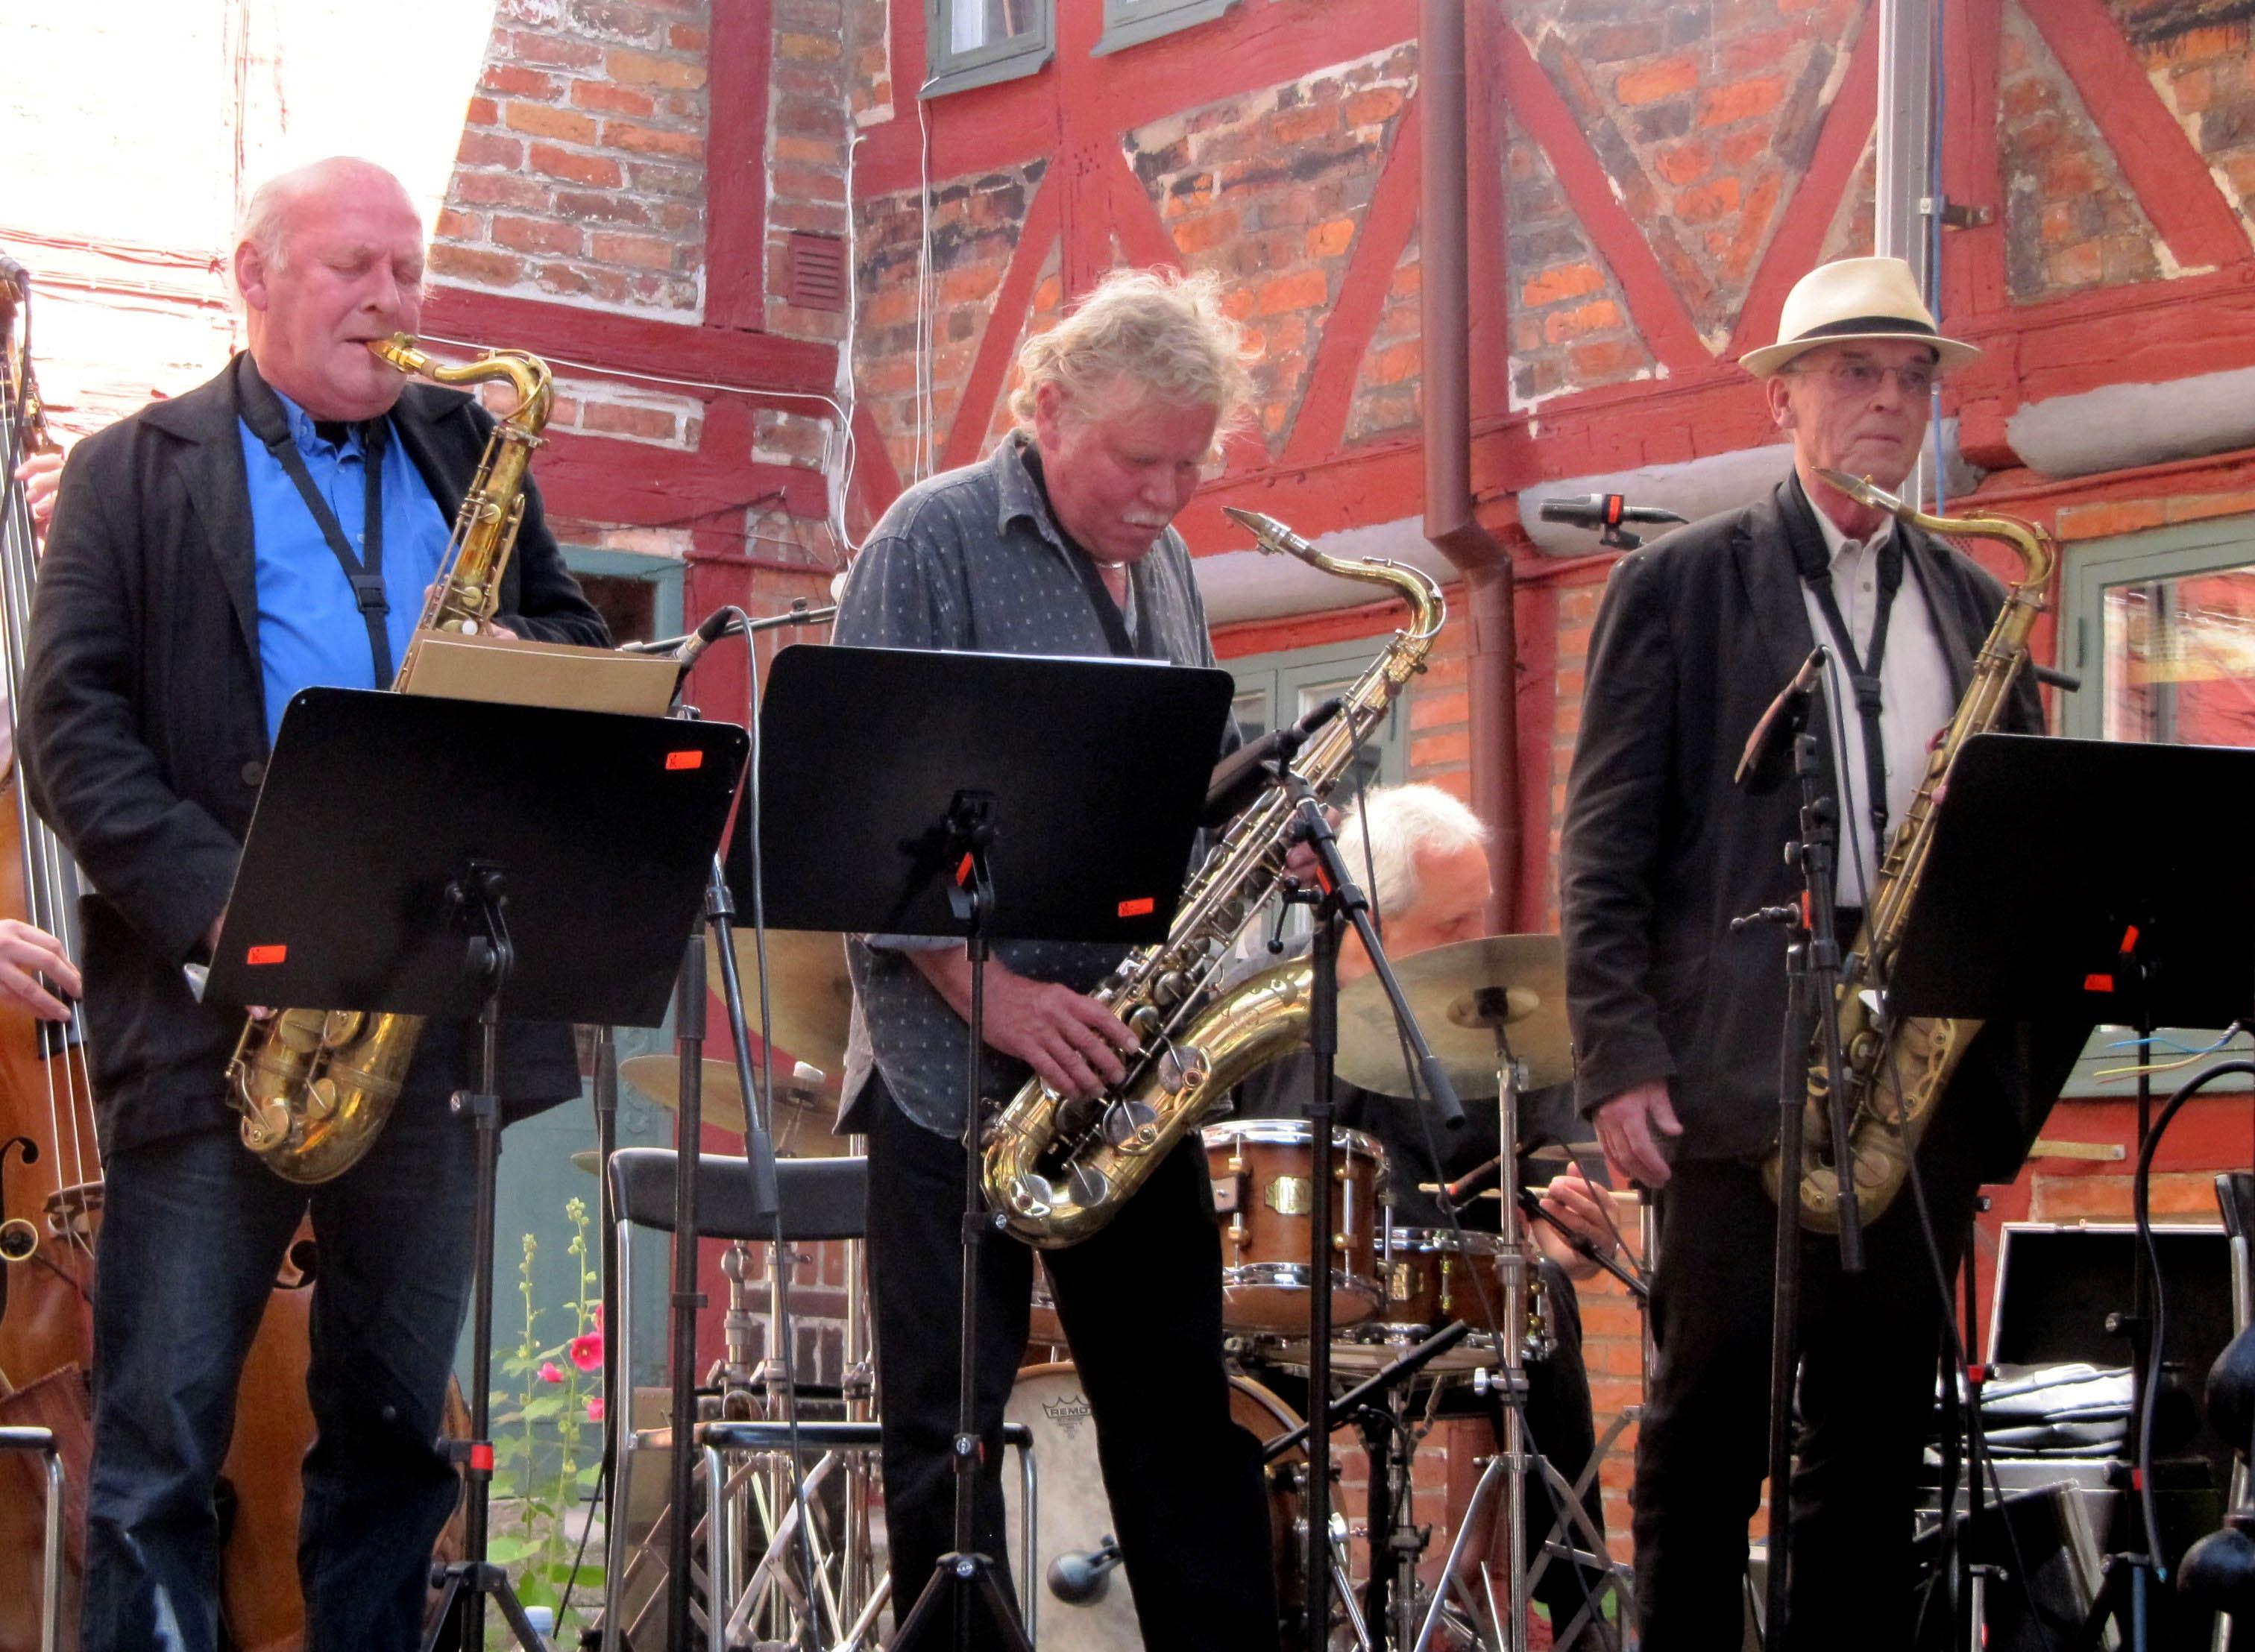 © Tre Tenorer / Jazz i Jemtland, THREE TENORS - ROSENGREN, SANDSTRÖM, ANDERSSON